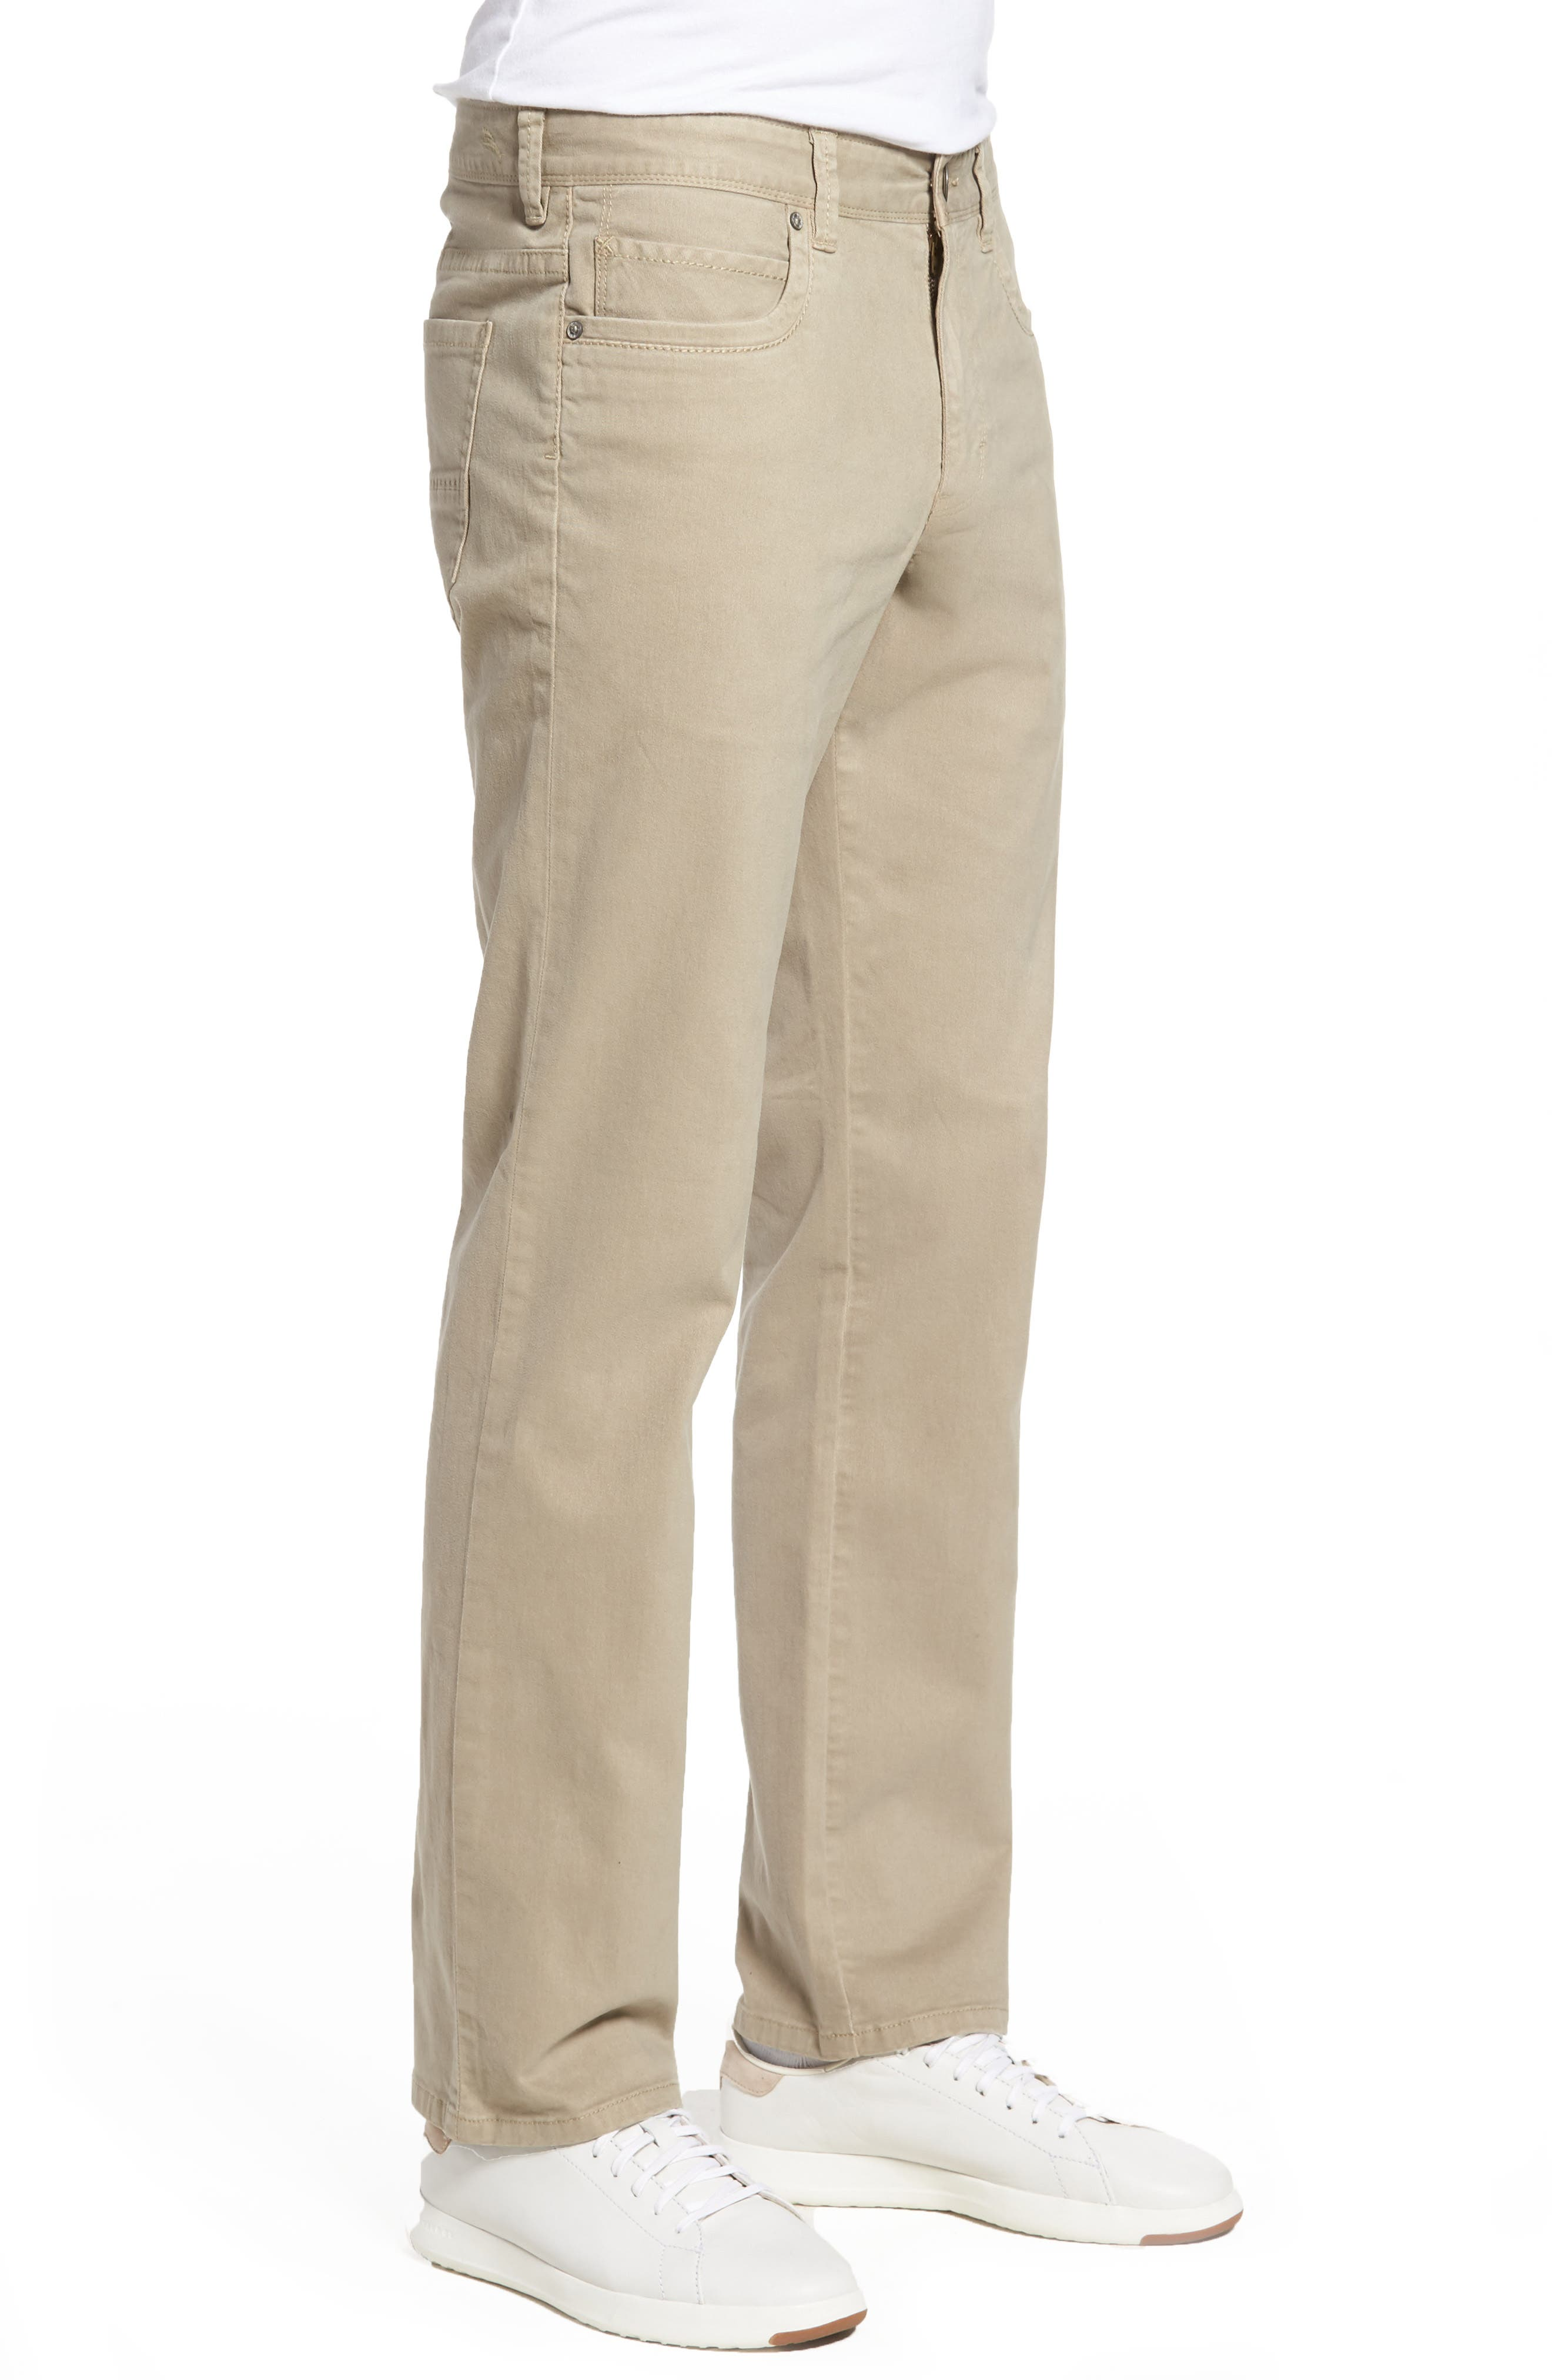 Boracay Pants,                             Alternate thumbnail 3, color,                             Khaki